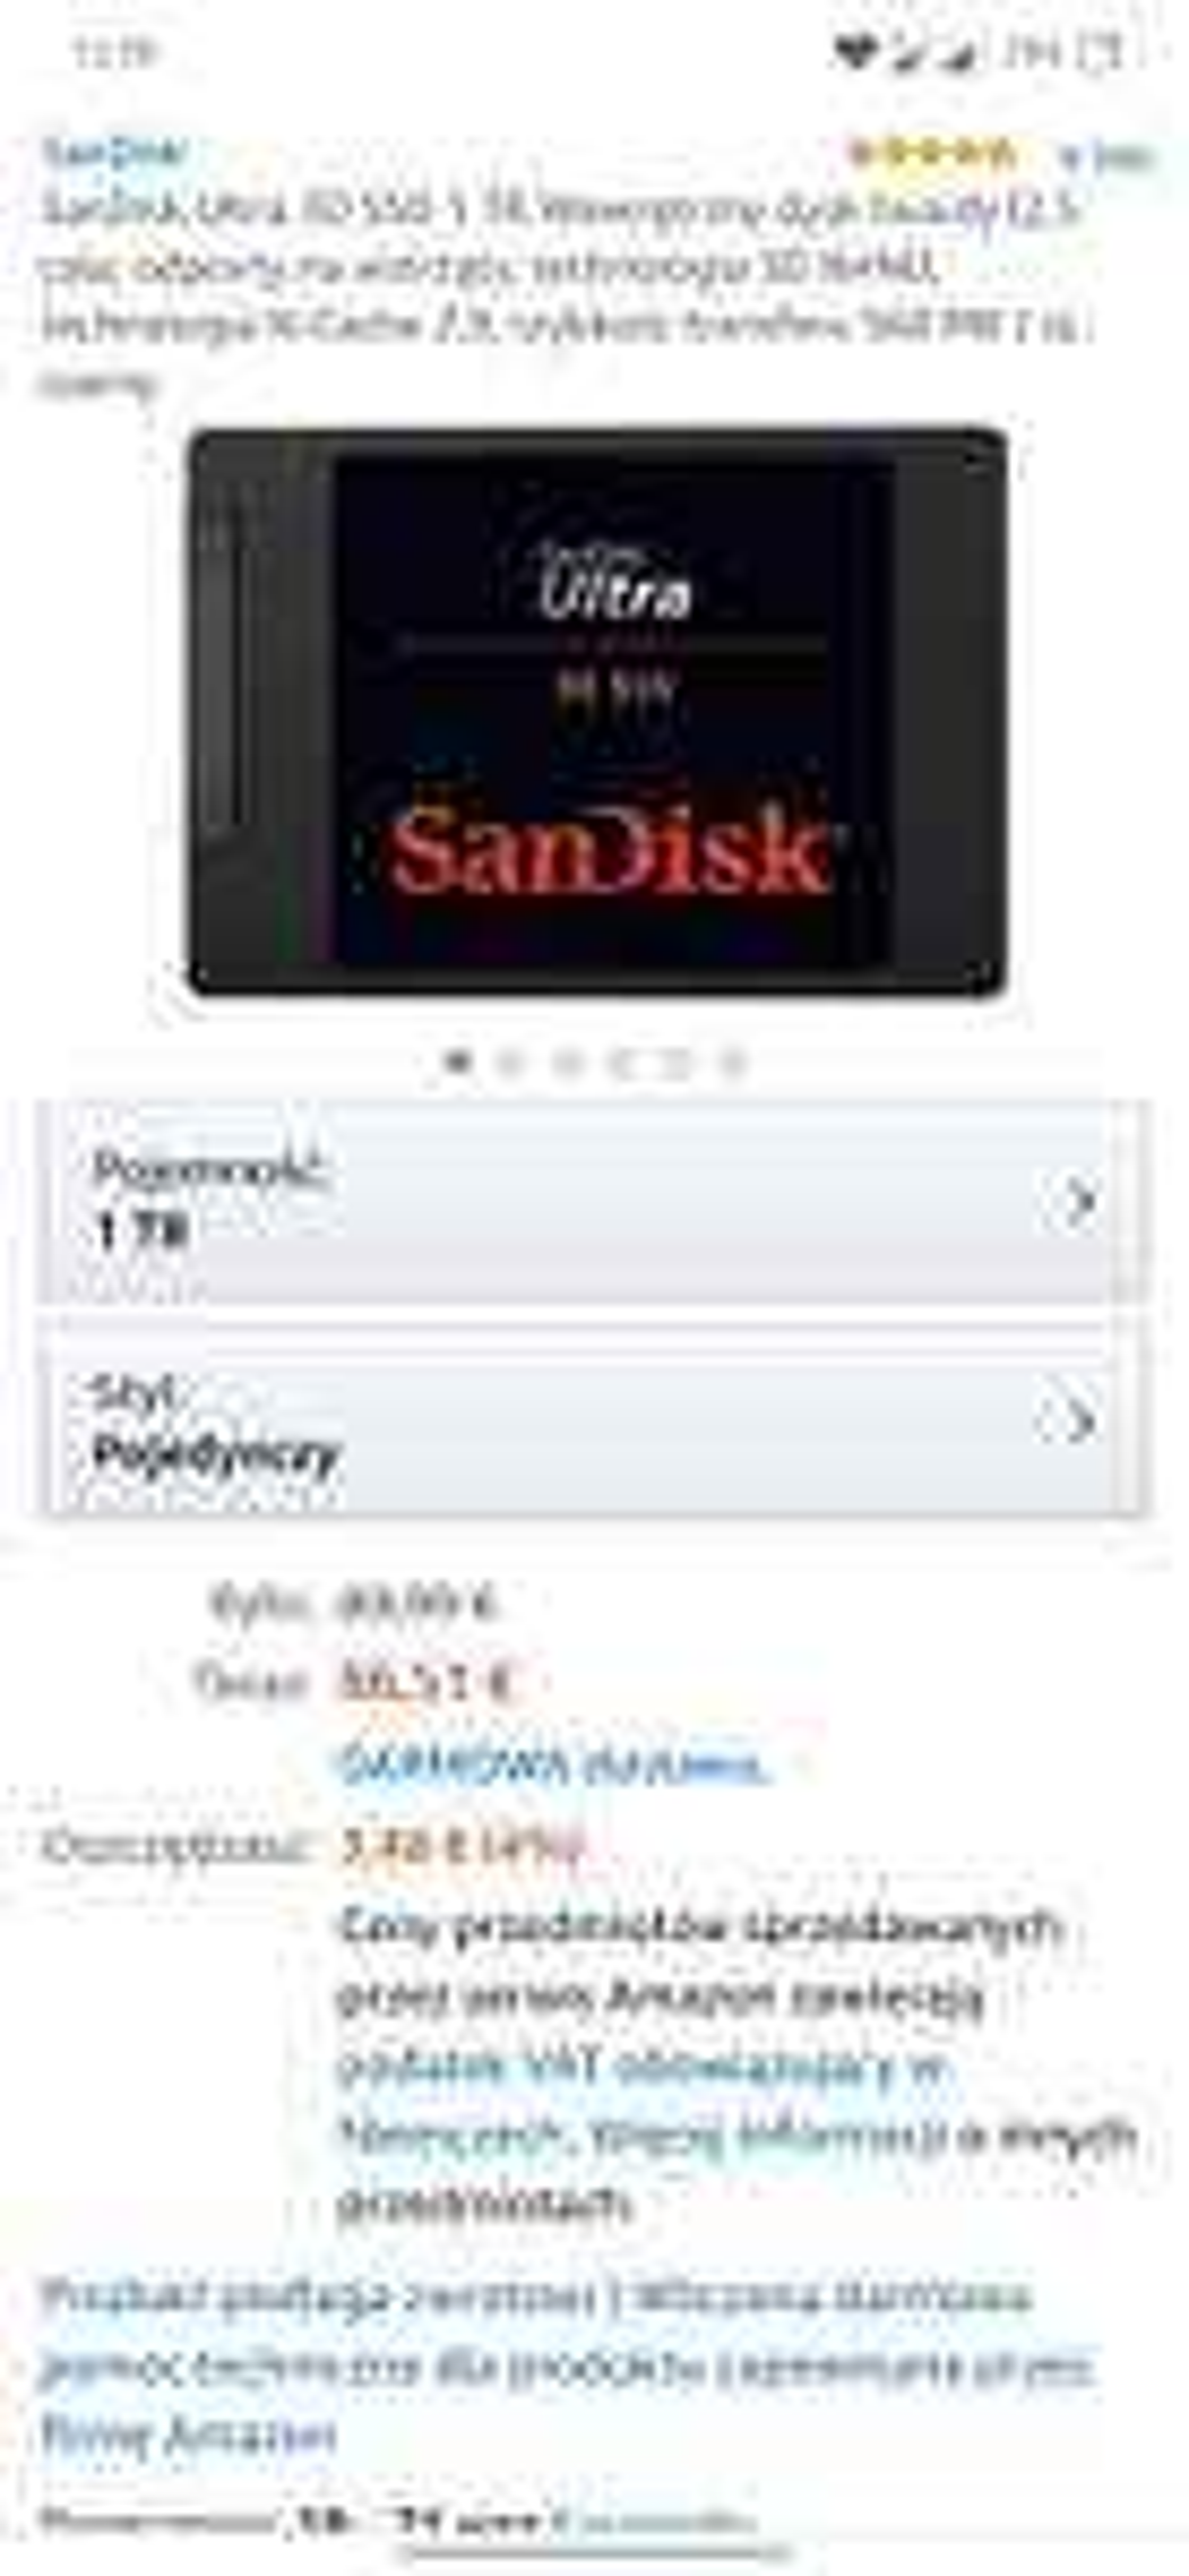 SanDisk Ultra 3D SSD 1 TB 92 euro